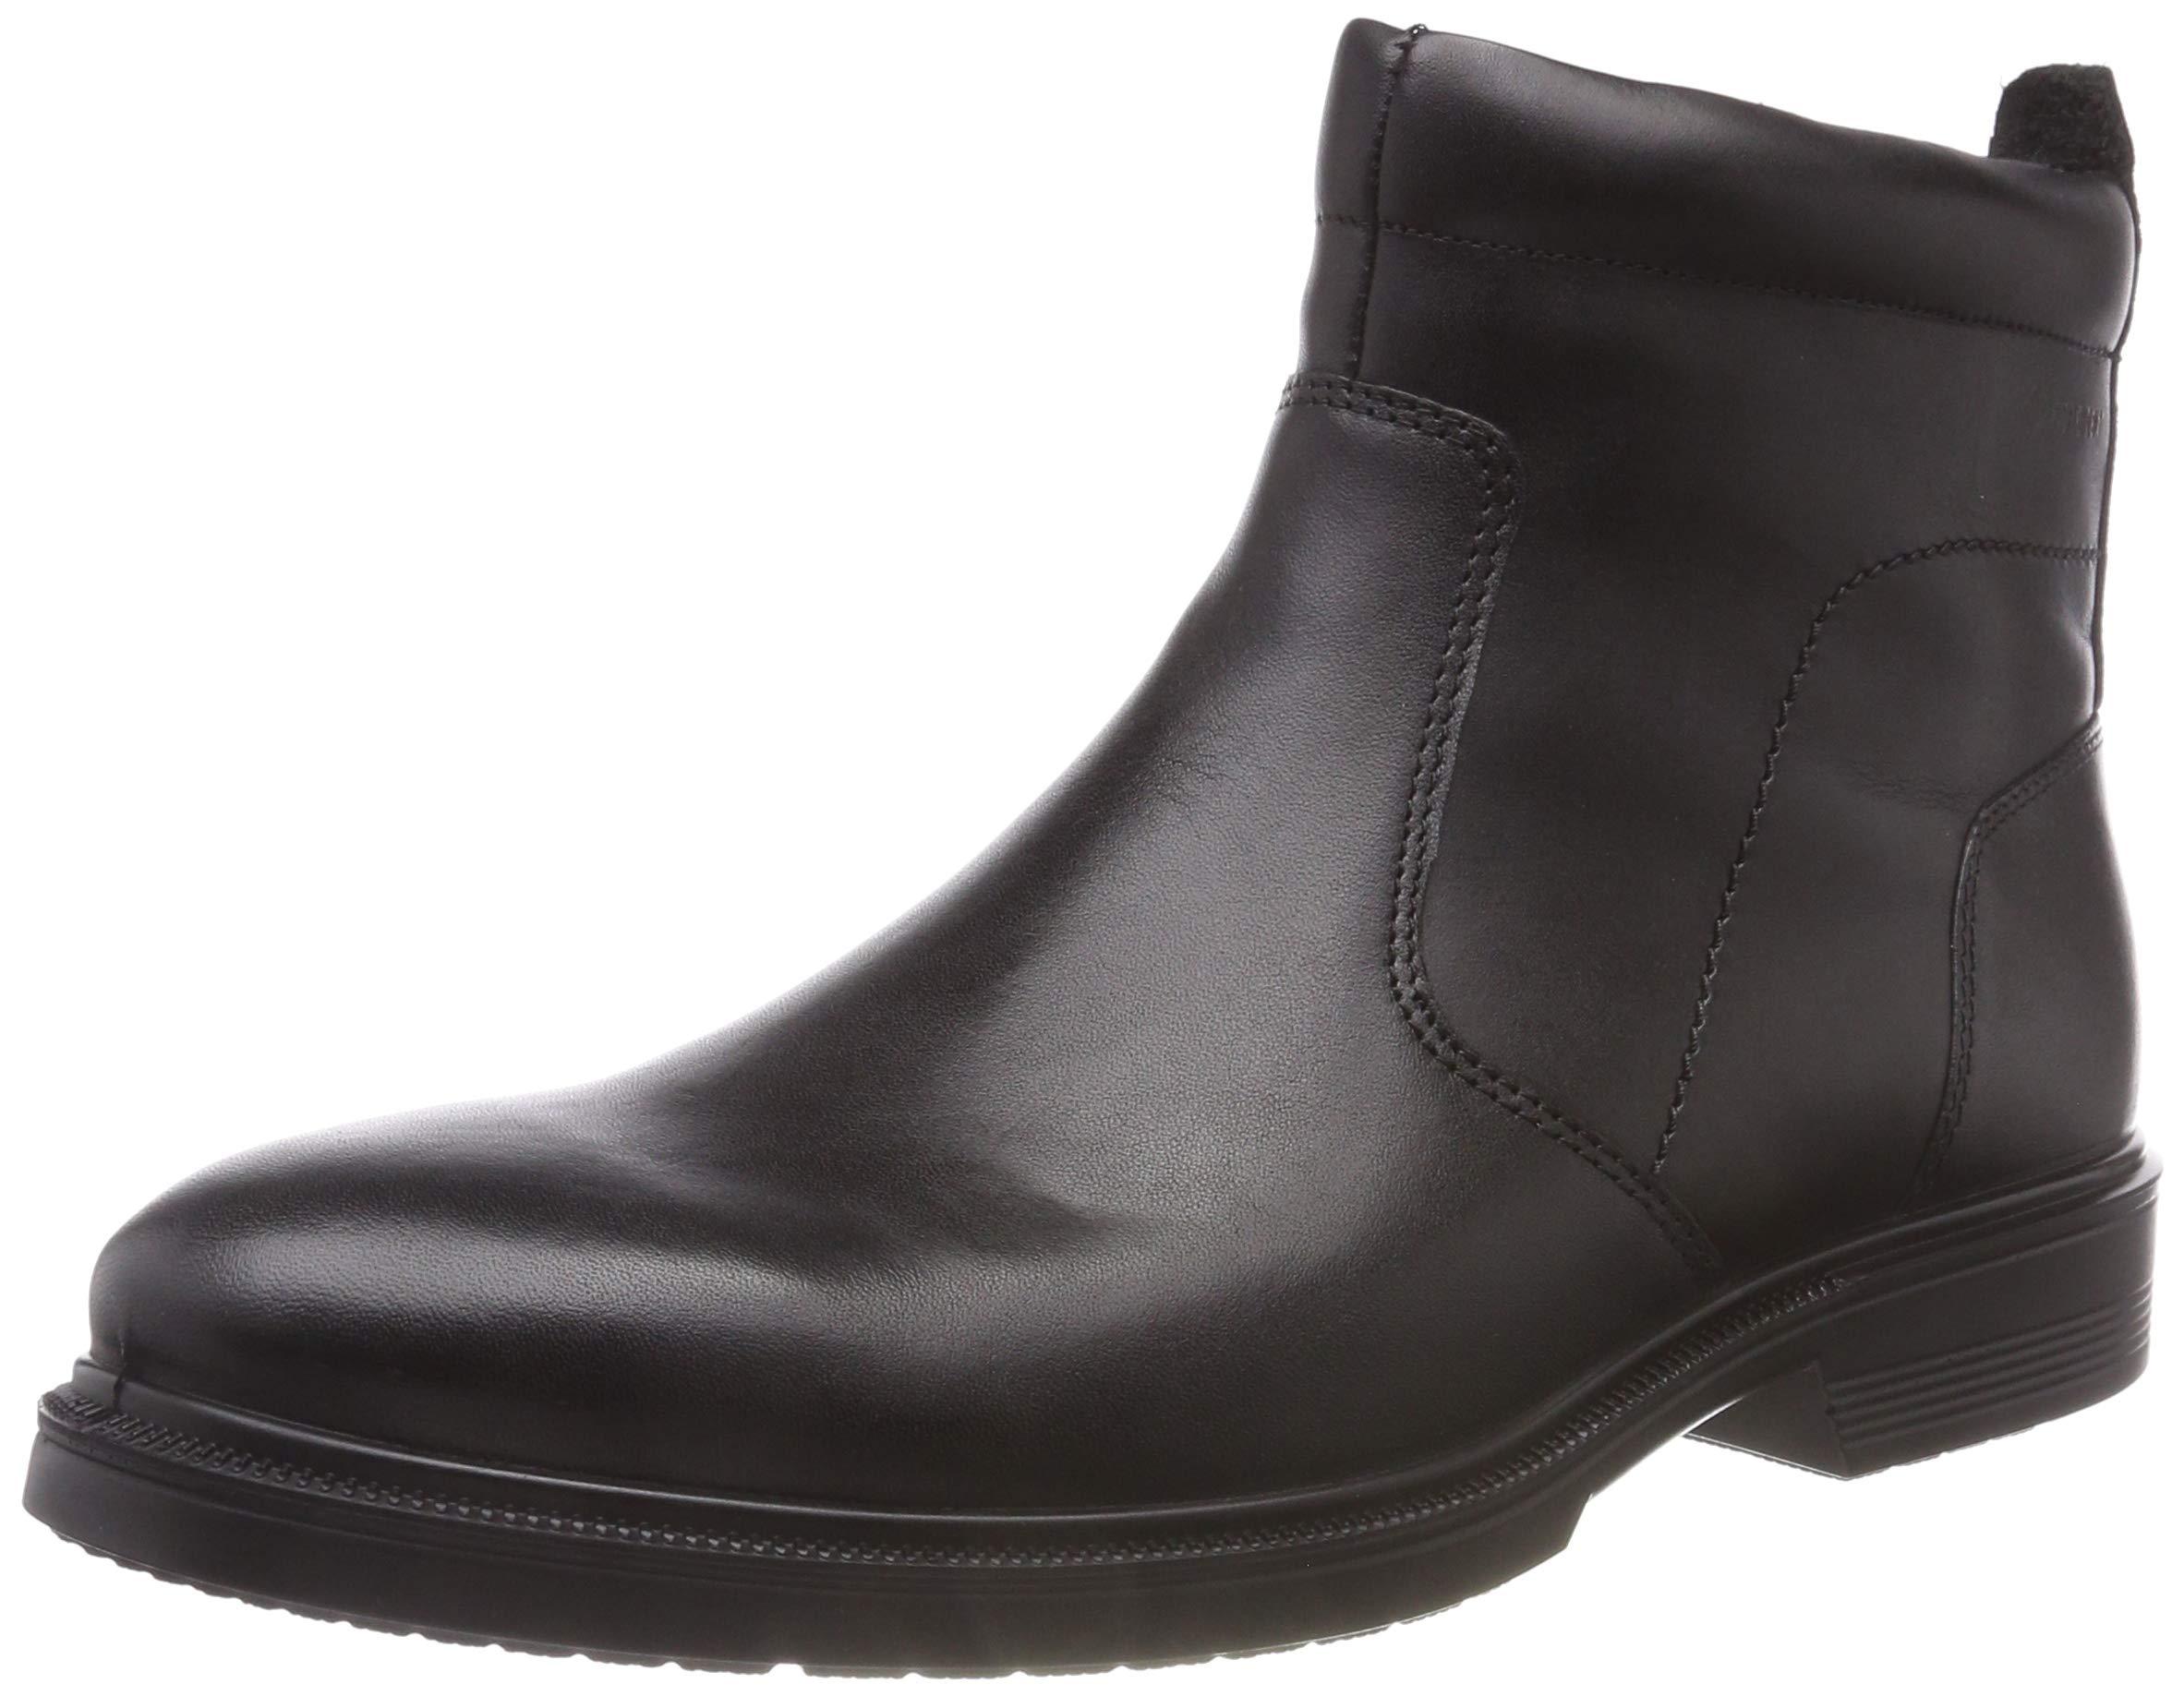 LisbonChelsea 100145 Ecco Boots HommeSchwarzblack Eu oredCxWB